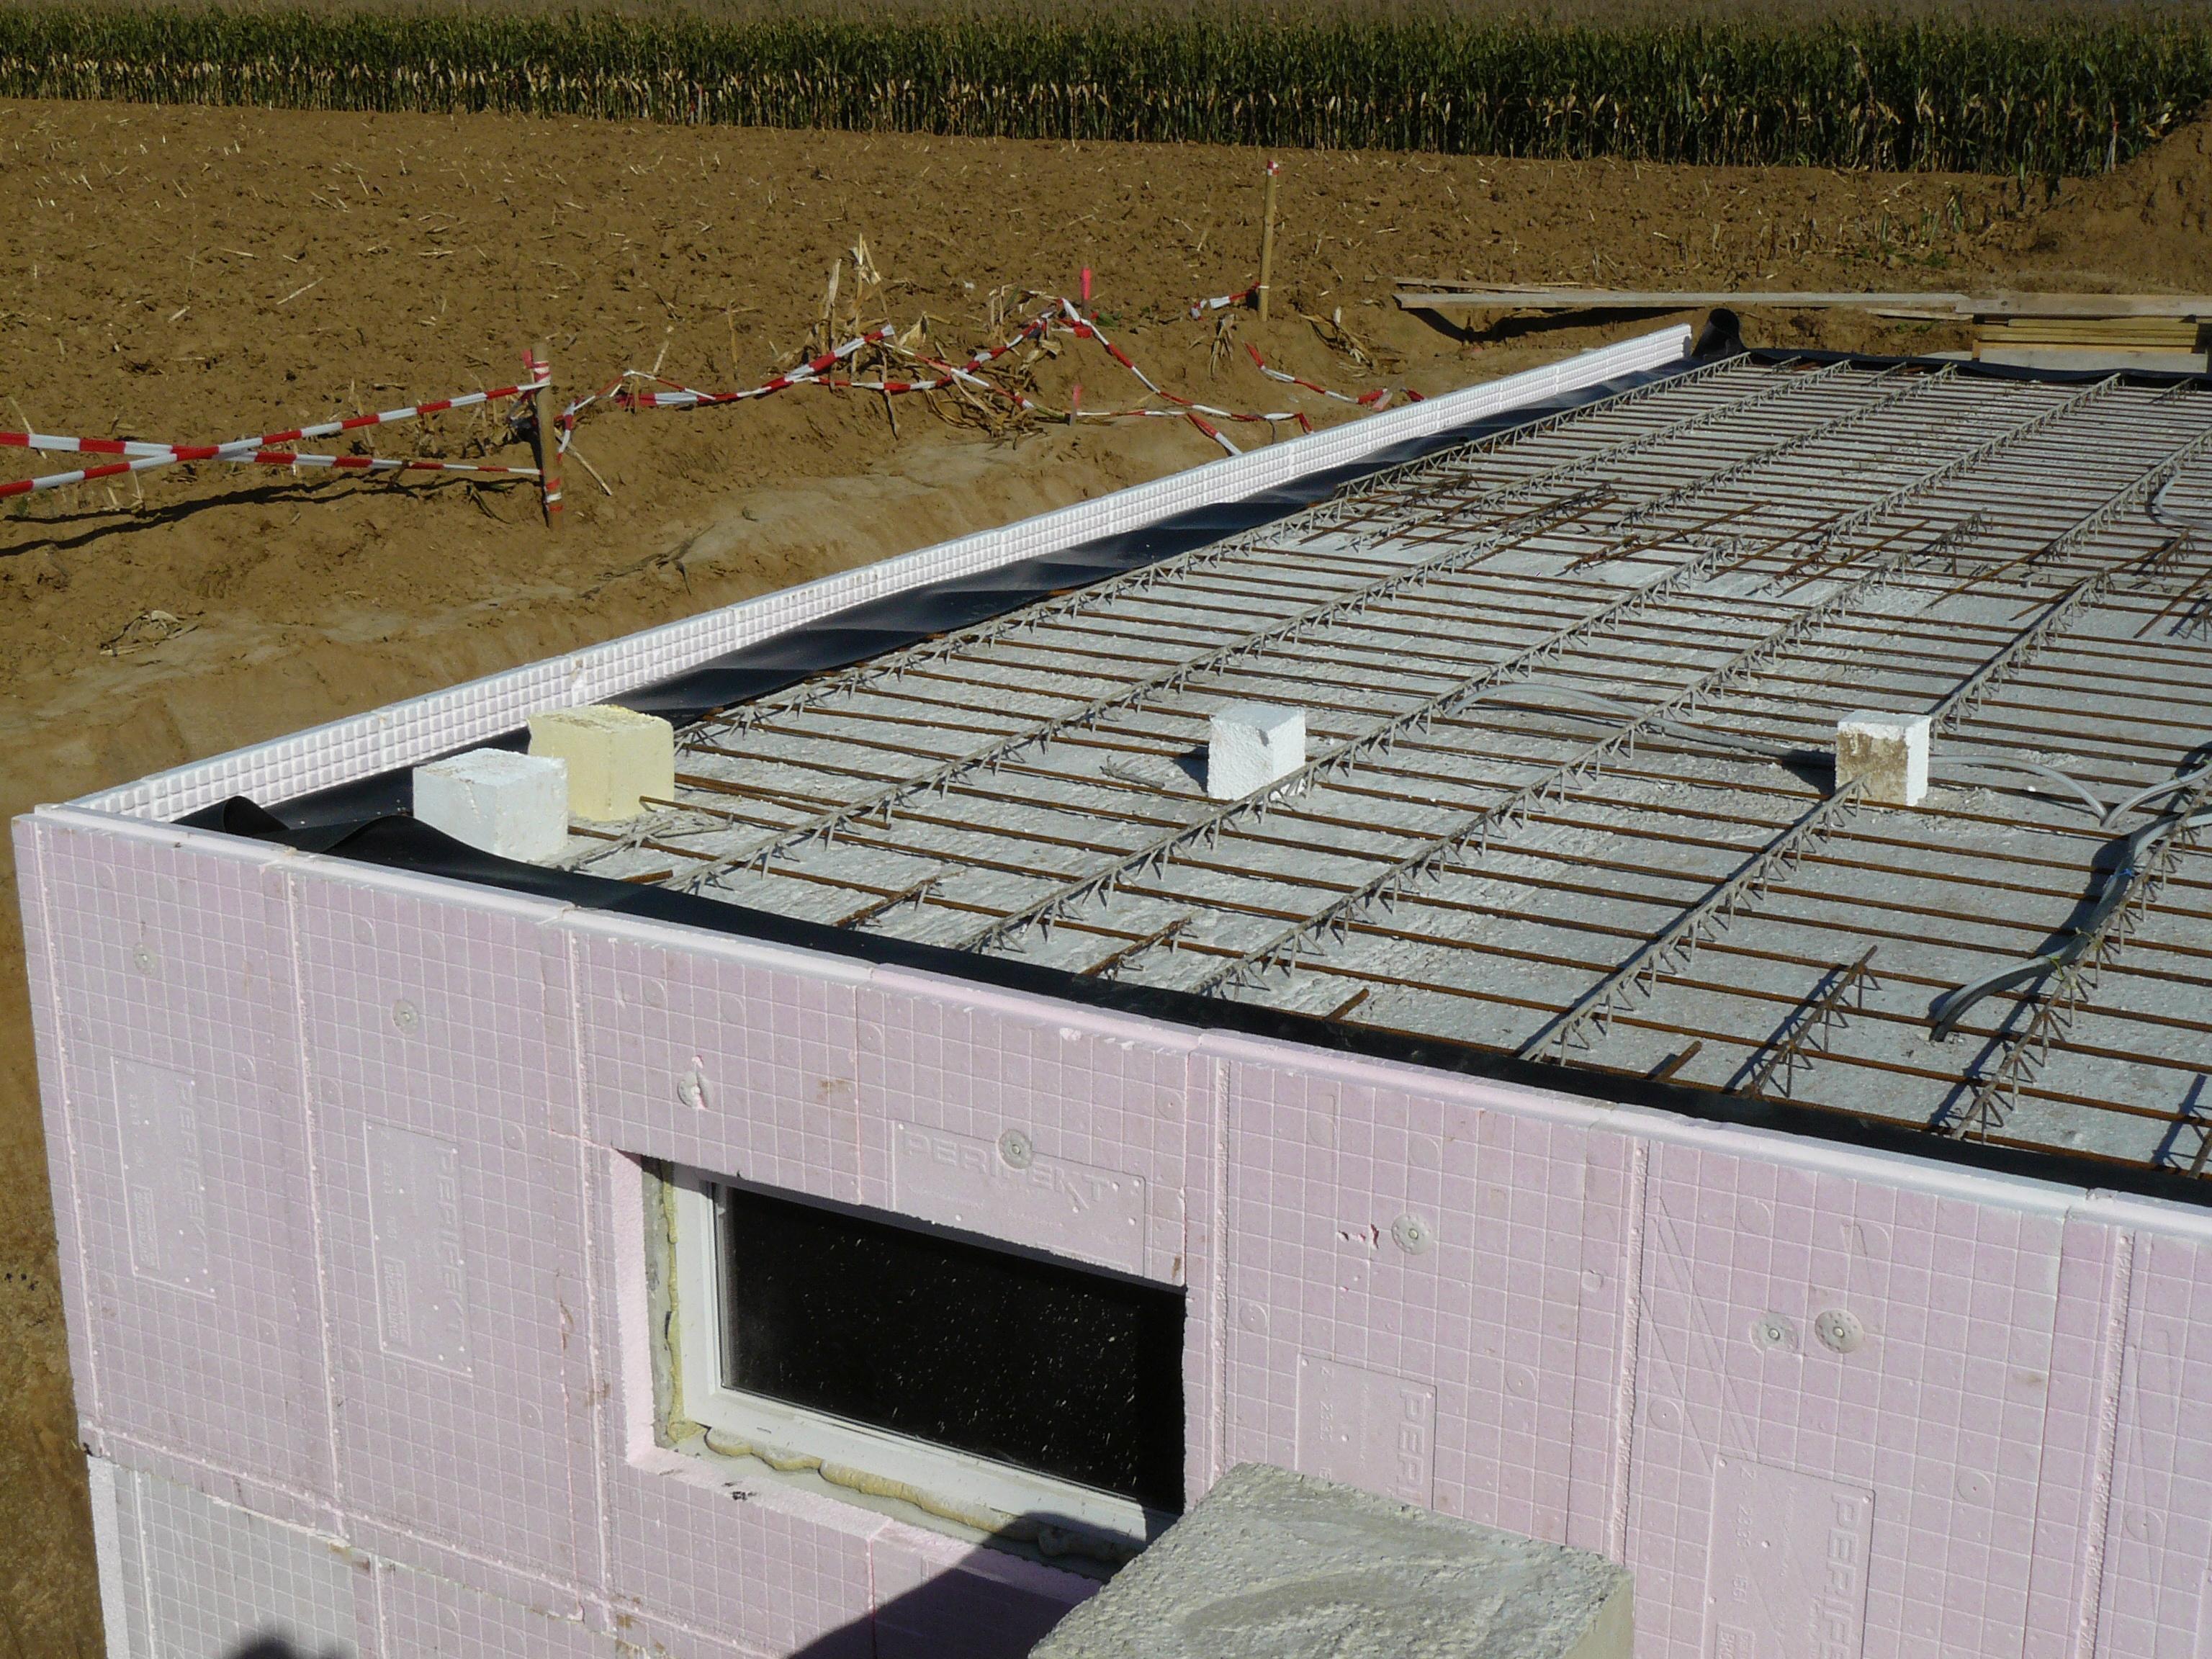 bautagebuch fronhoven » kelleraufbau tag 5: außenwanddämmung